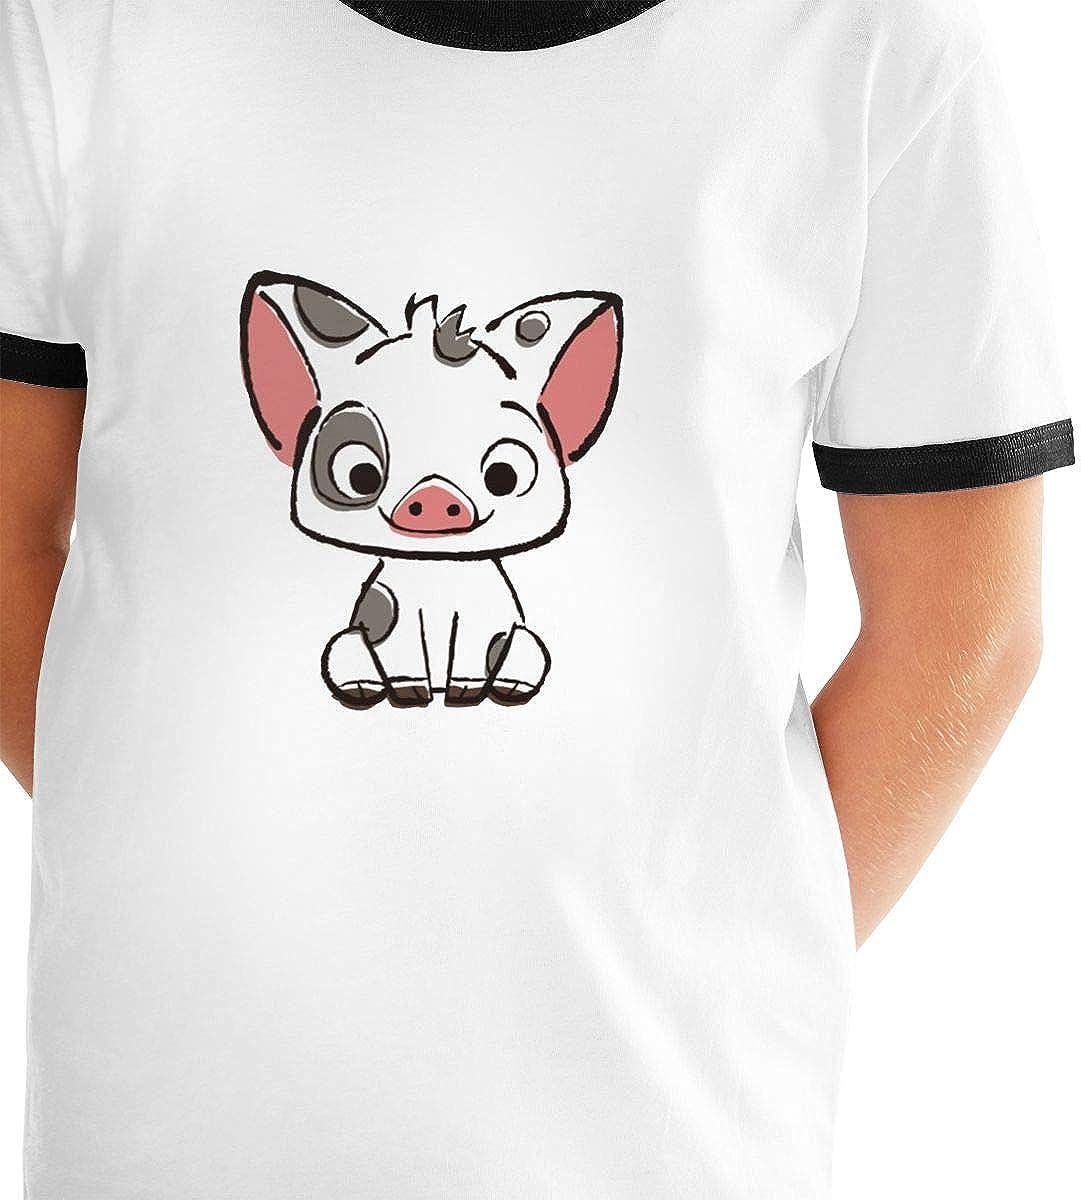 Kids Or Little Boys and Girls Richard Moana Pua The Pot Bellied Pig Unisex Childrens Short Sleeve T-Shirt